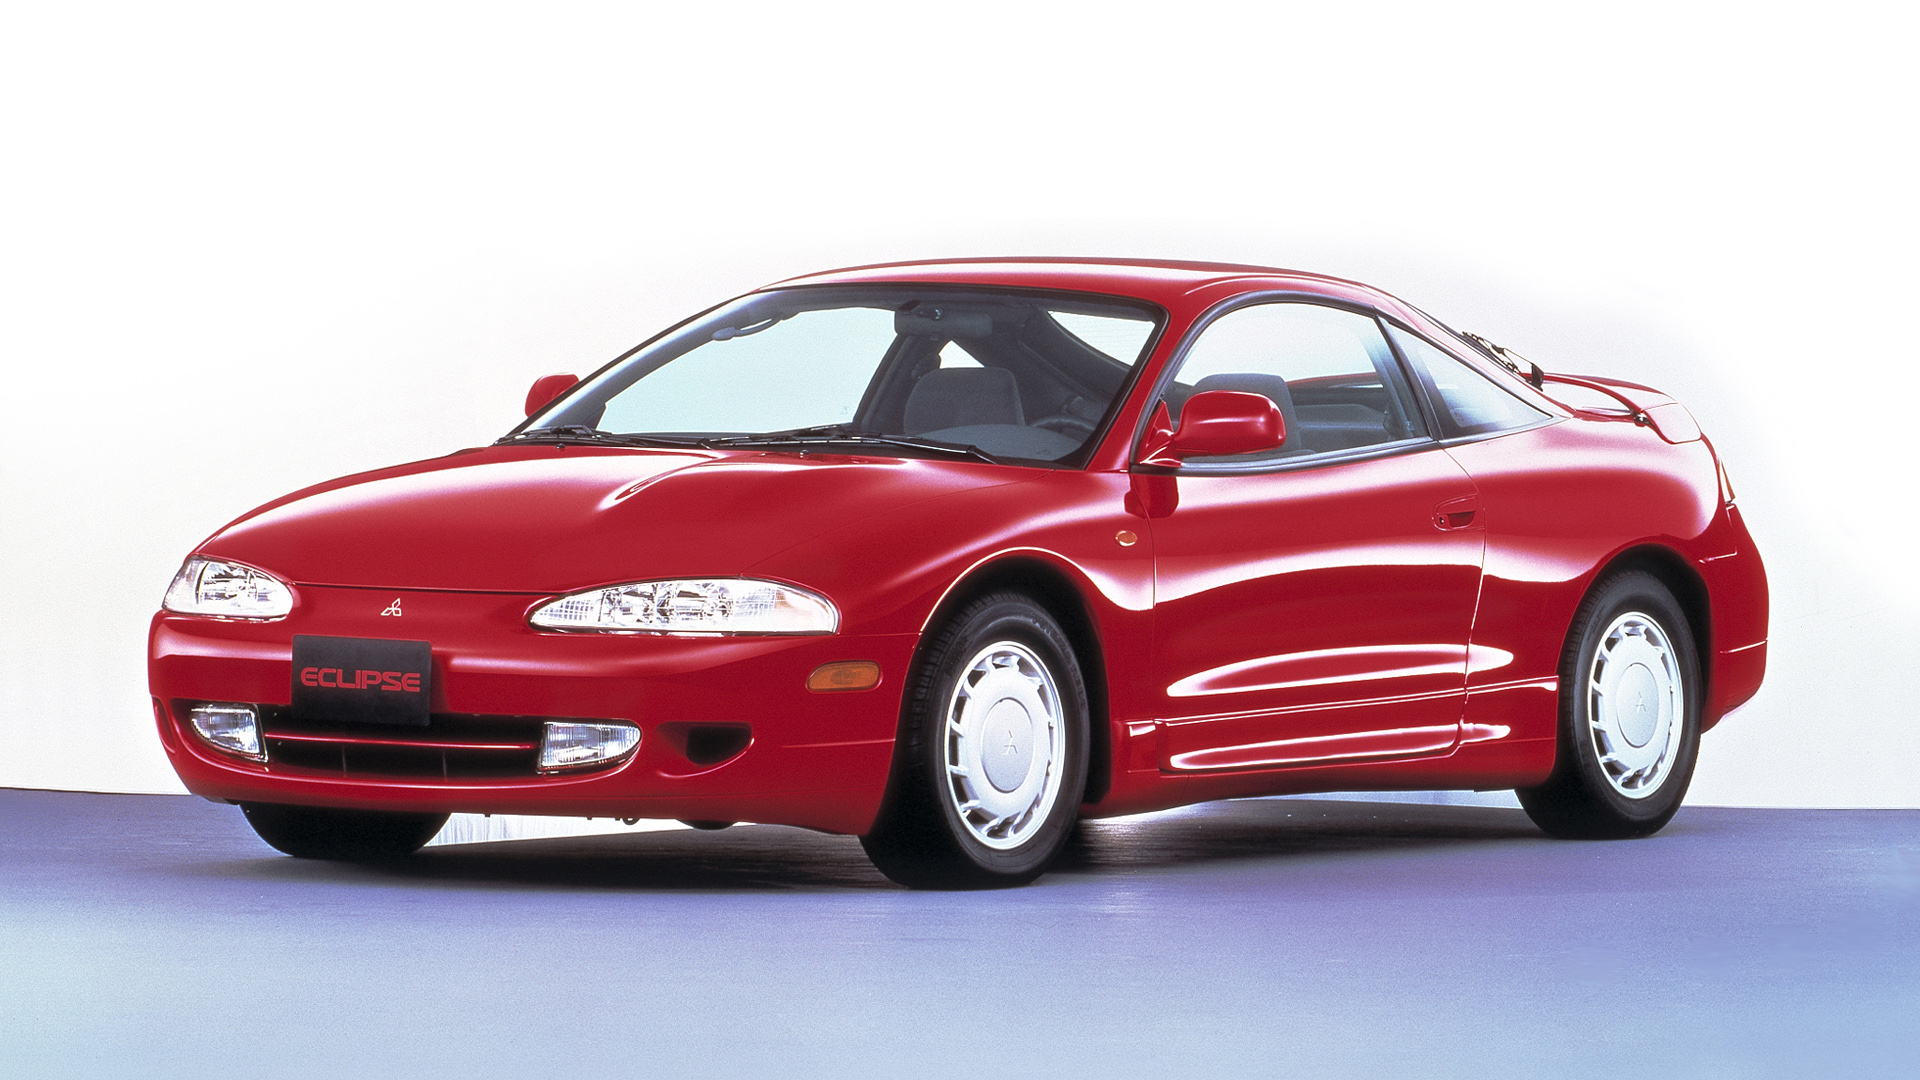 Mitsubishi Eclipse II - polecane samochody coupe, jakie coupe do 10 tys